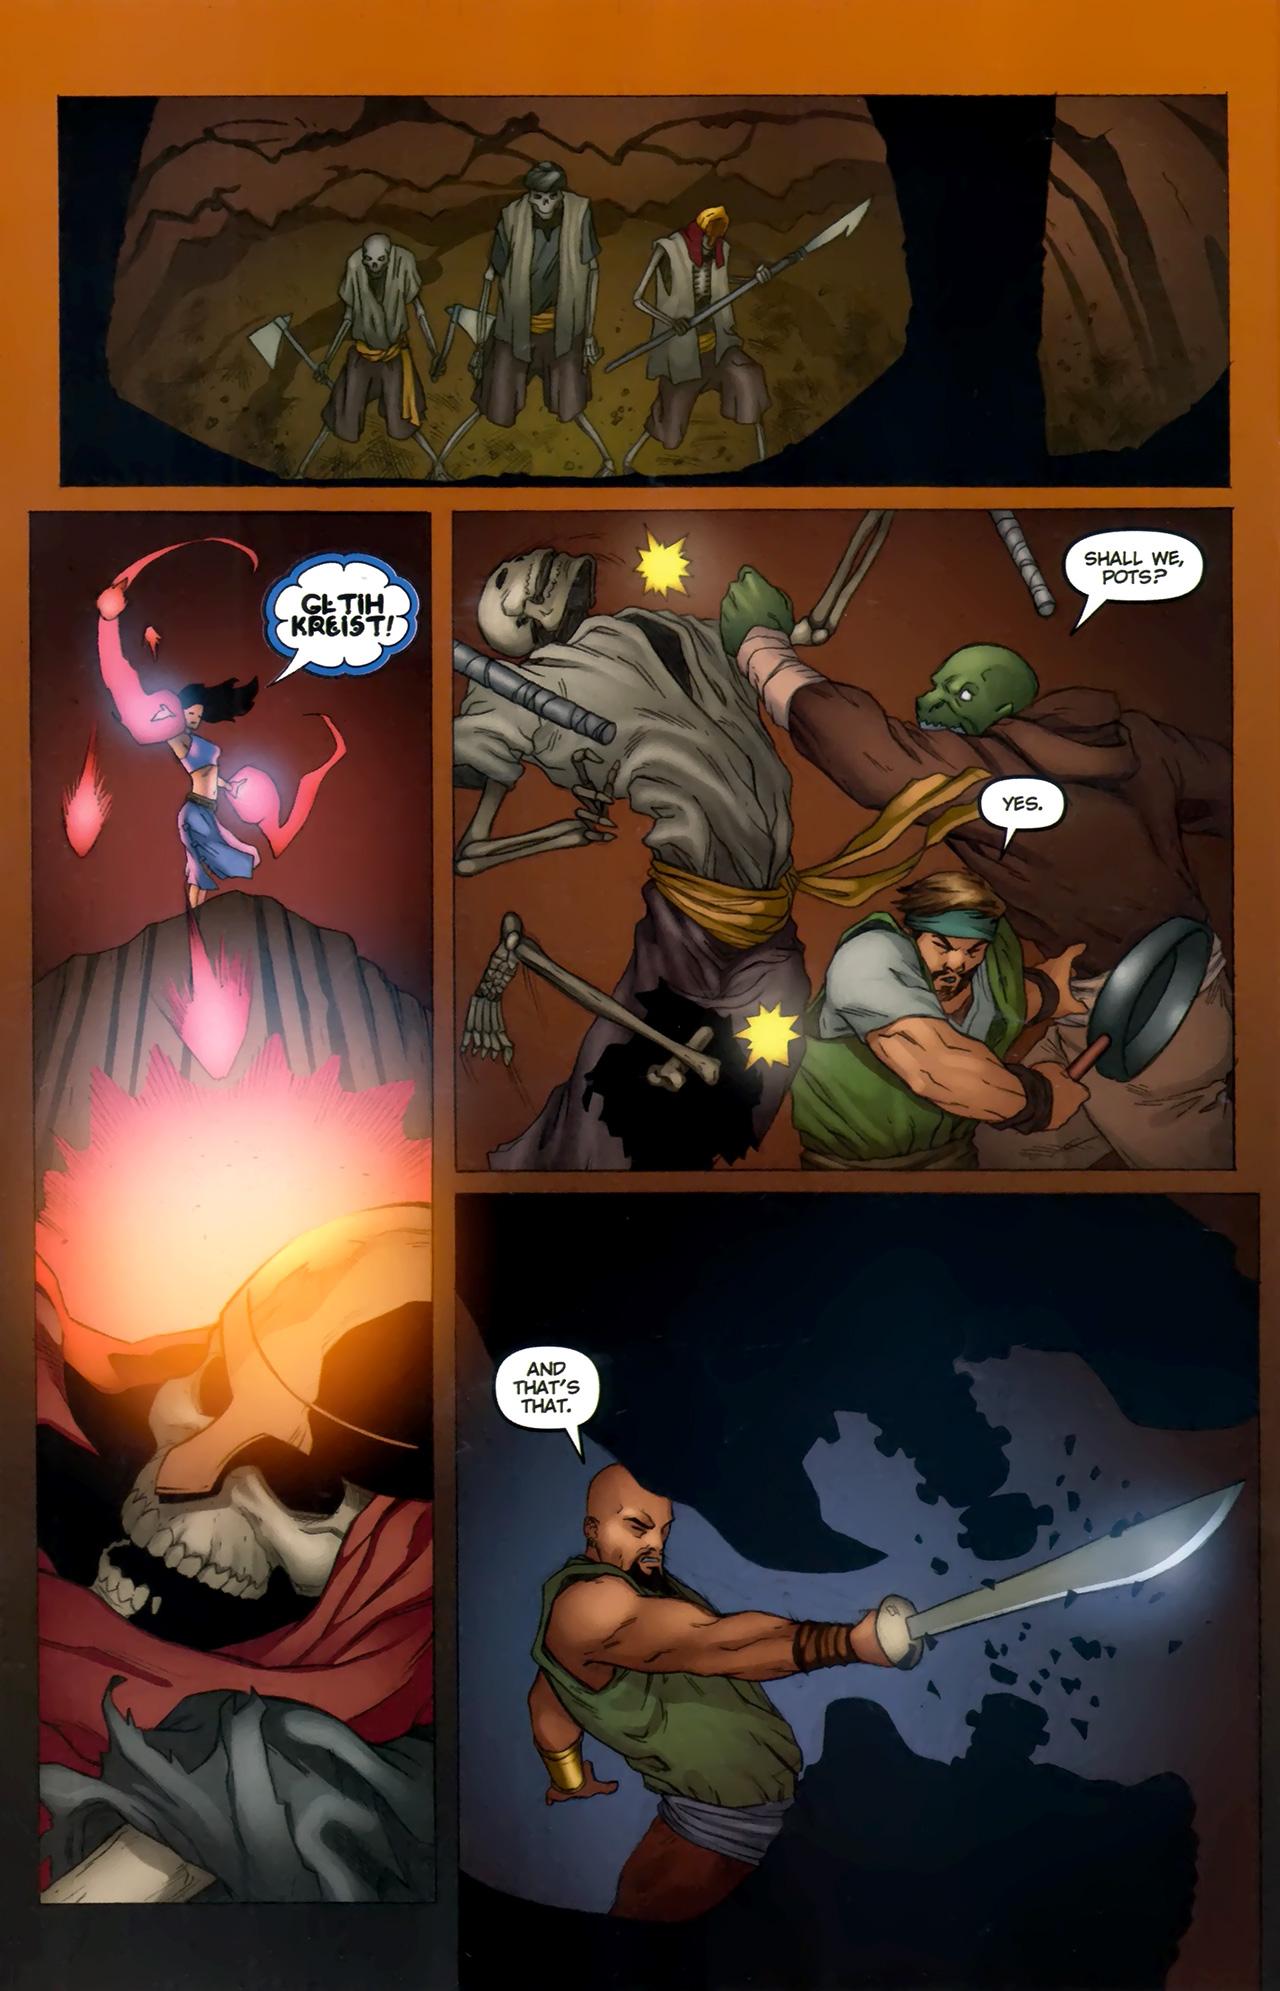 Read online 1001 Arabian Nights: The Adventures of Sinbad comic -  Issue #11 - 22